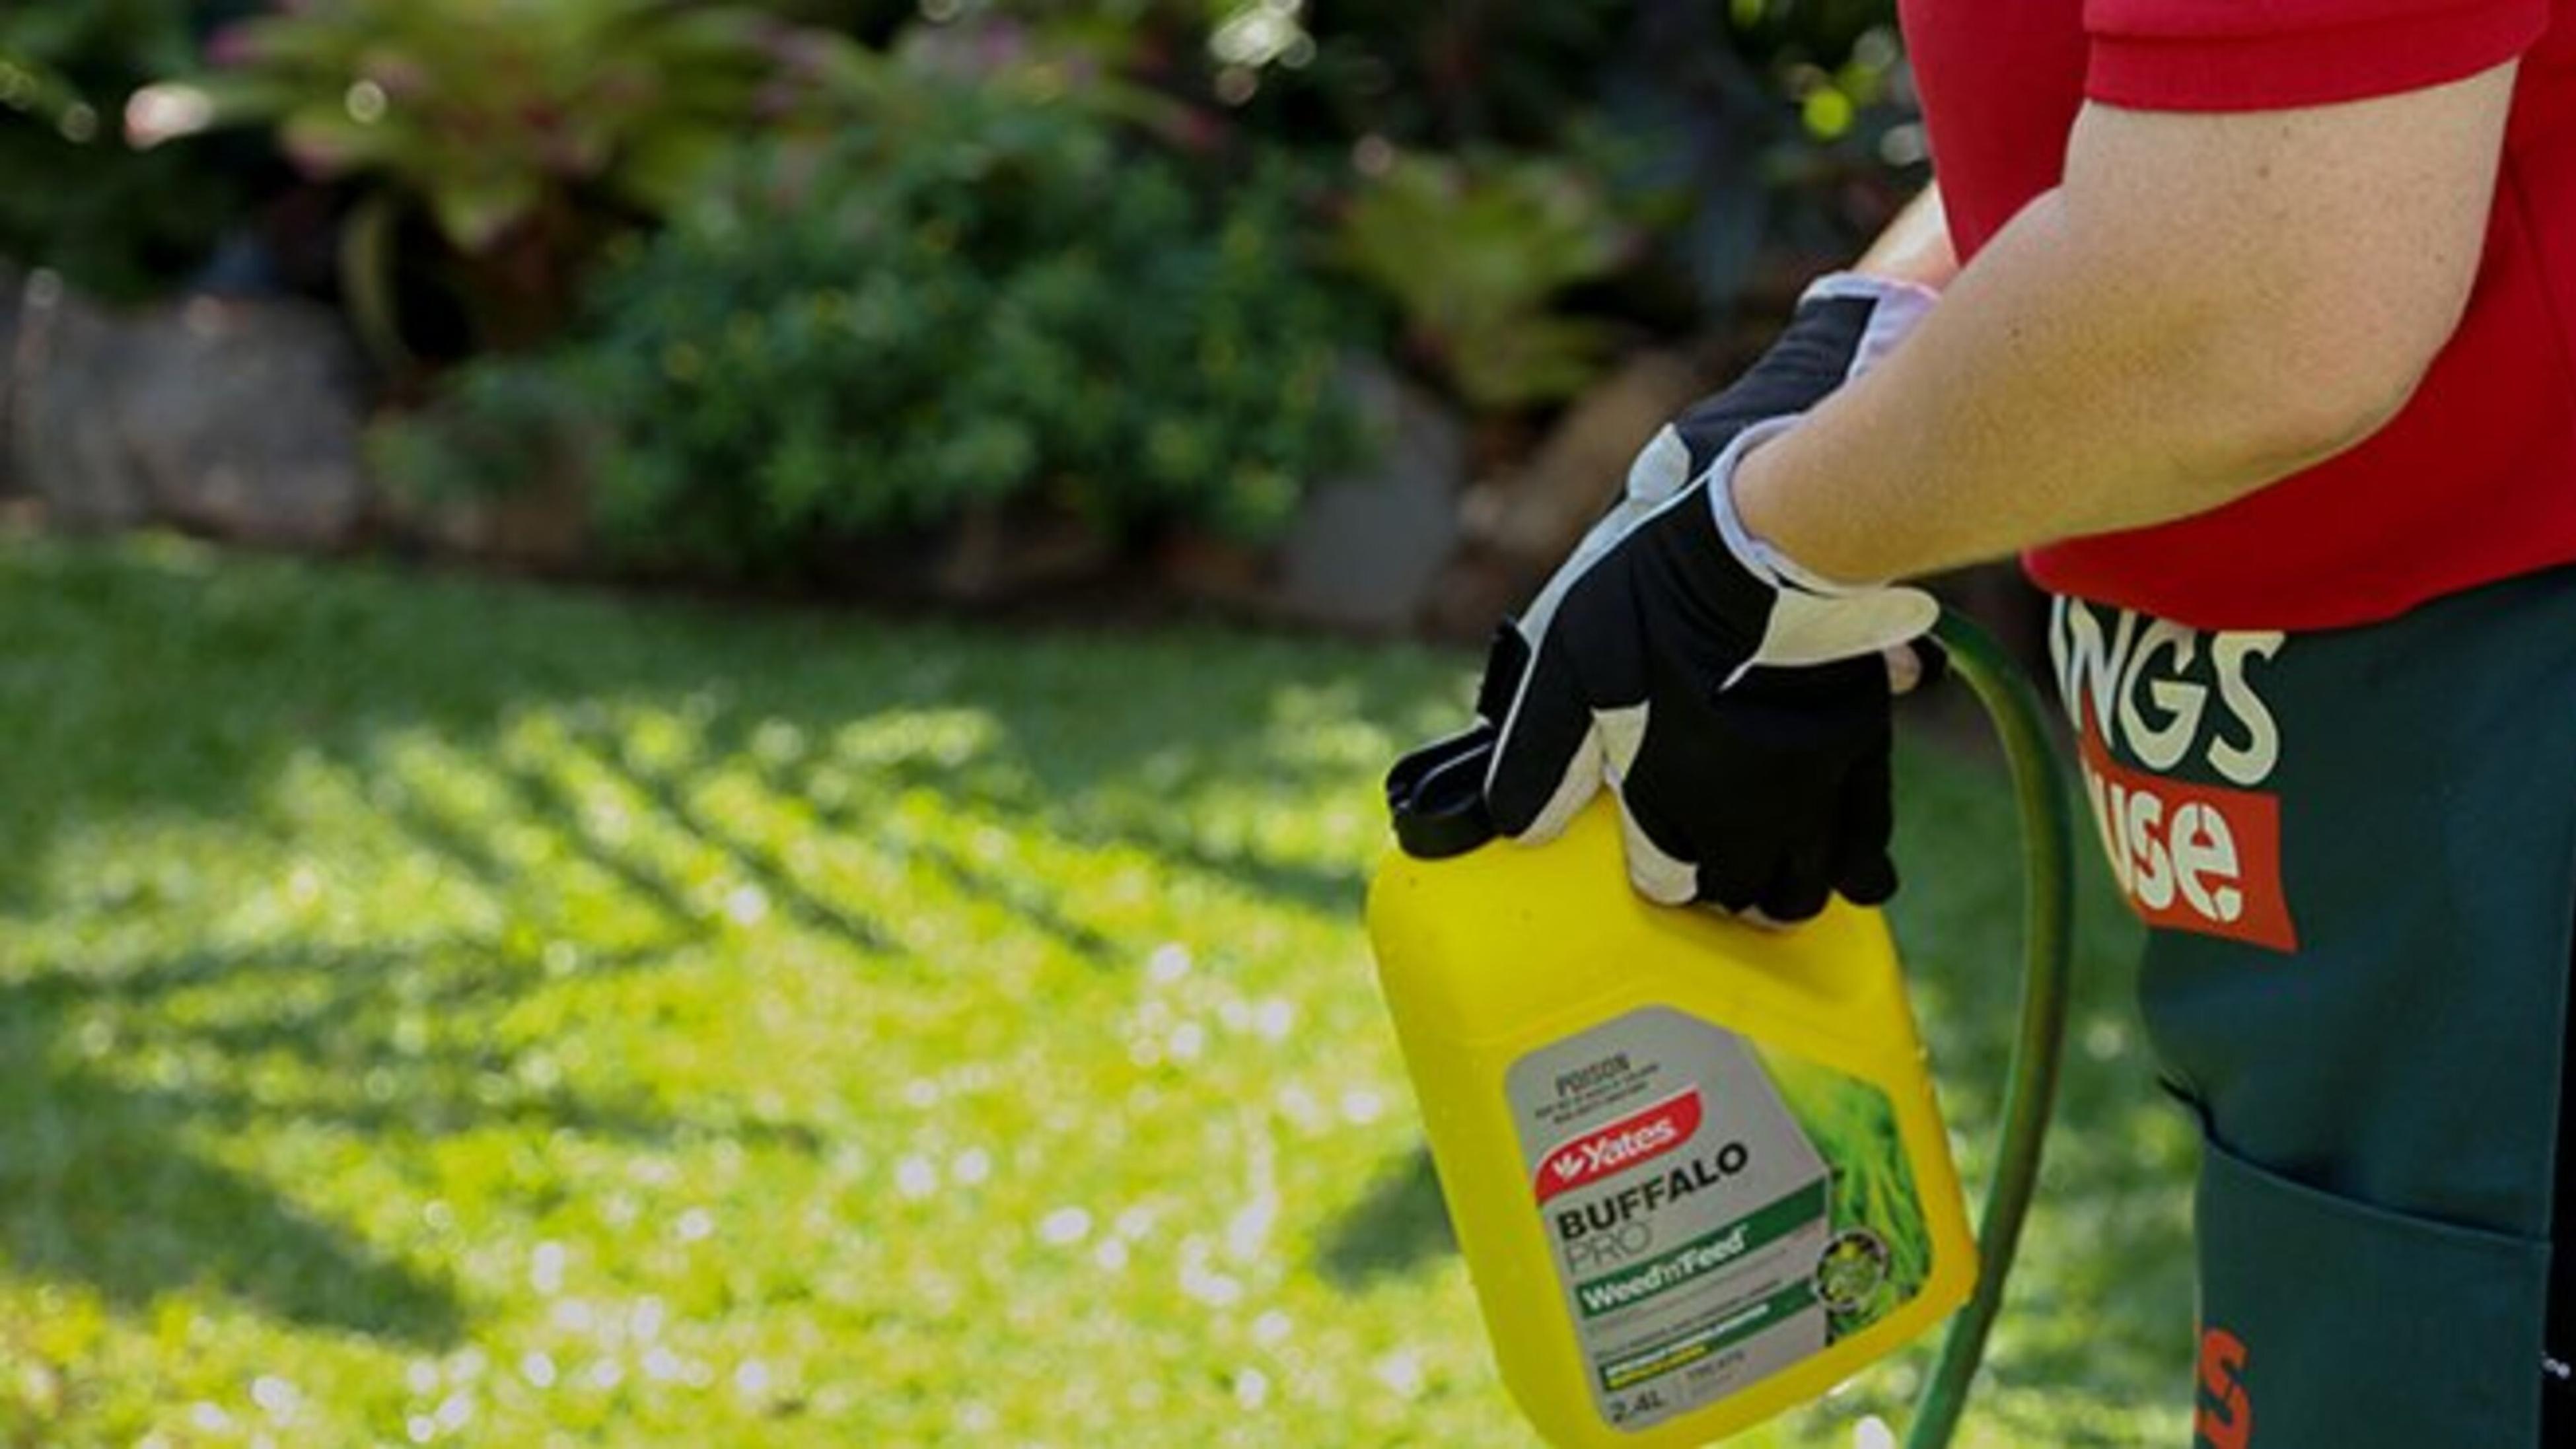 Person spraying Buffalo Pro fertiliser on lawn.